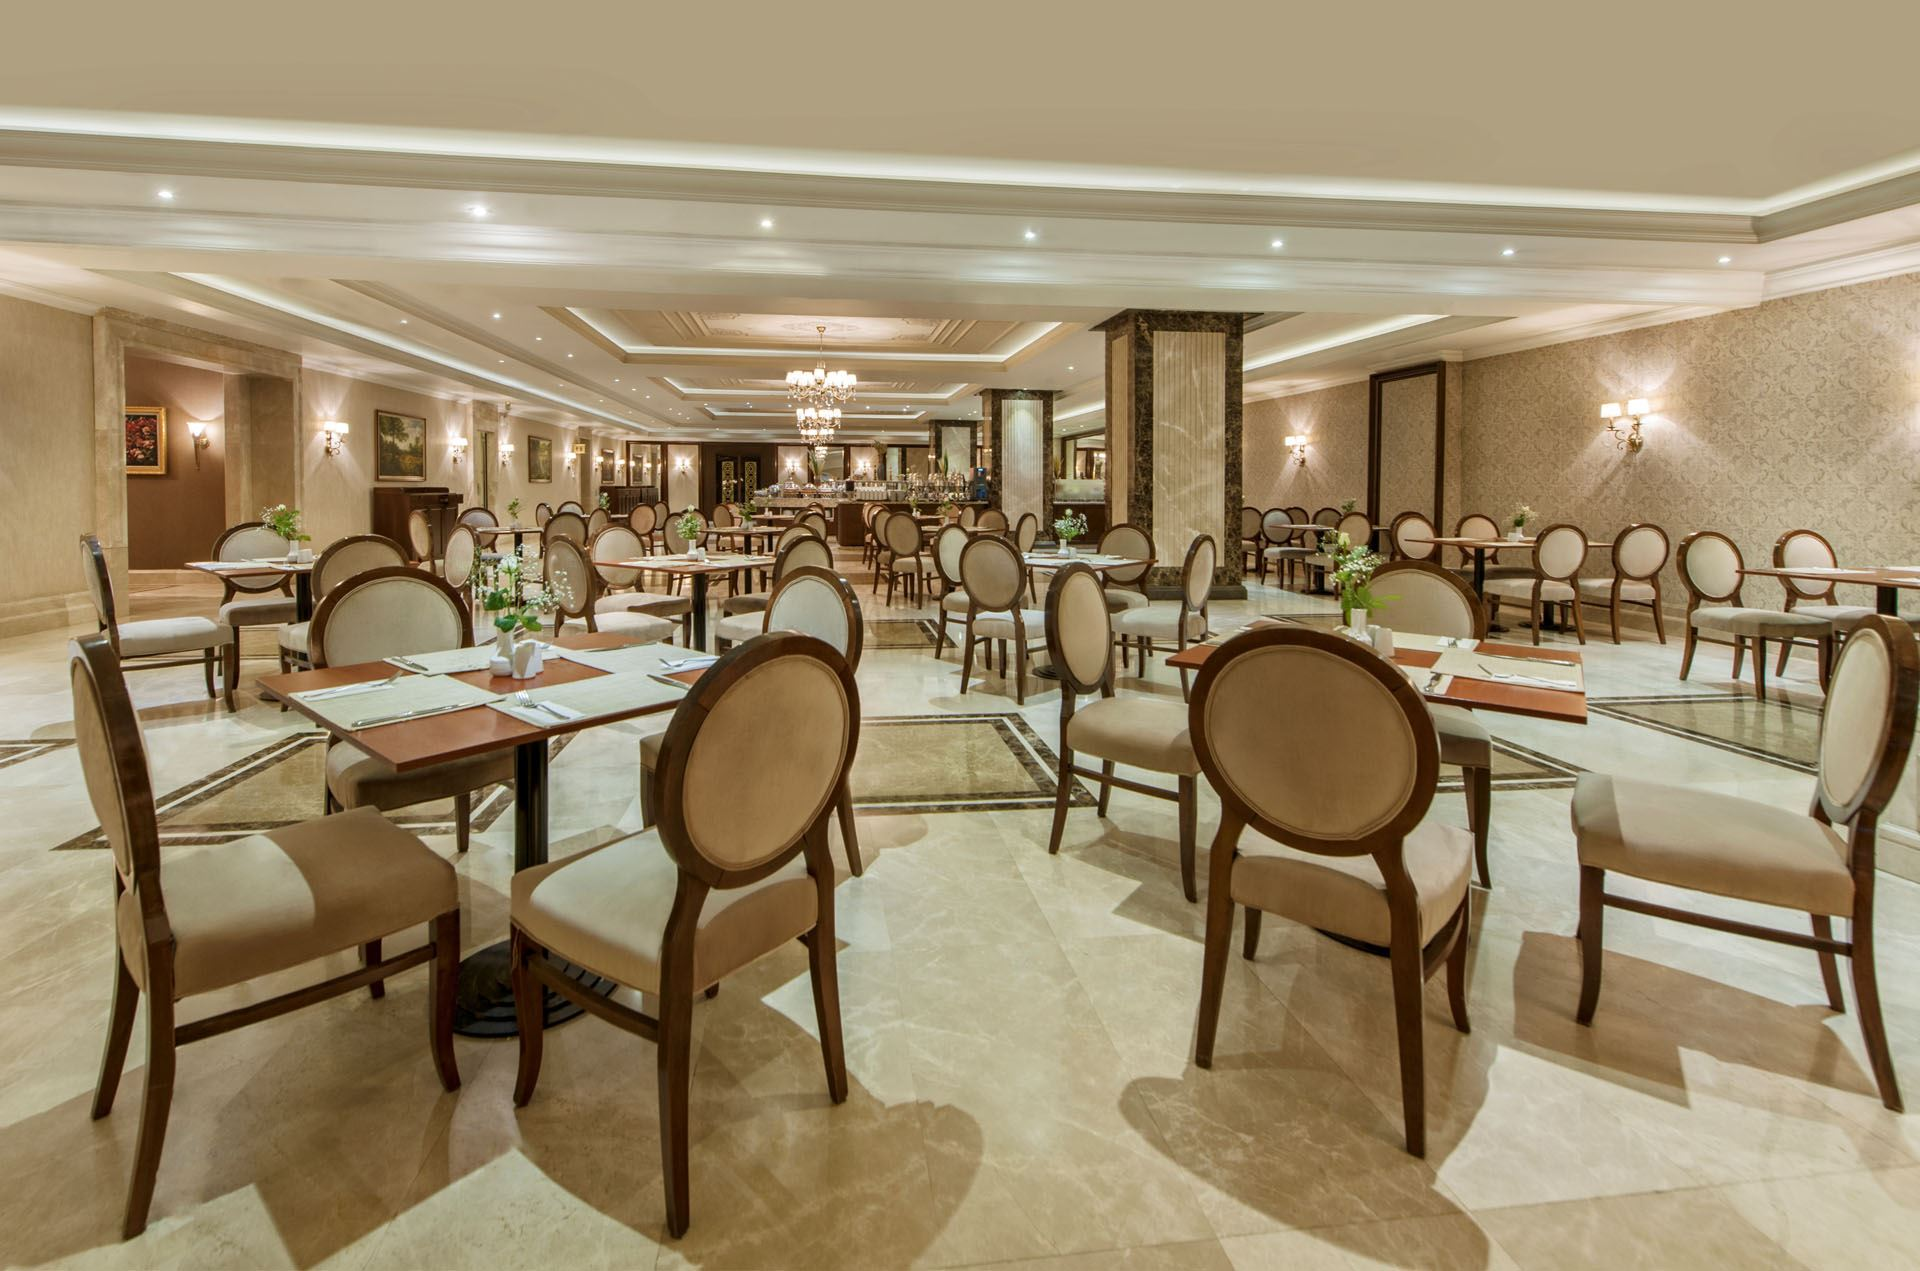 elite-restaurant رستوران ها و کافه های شهر وان